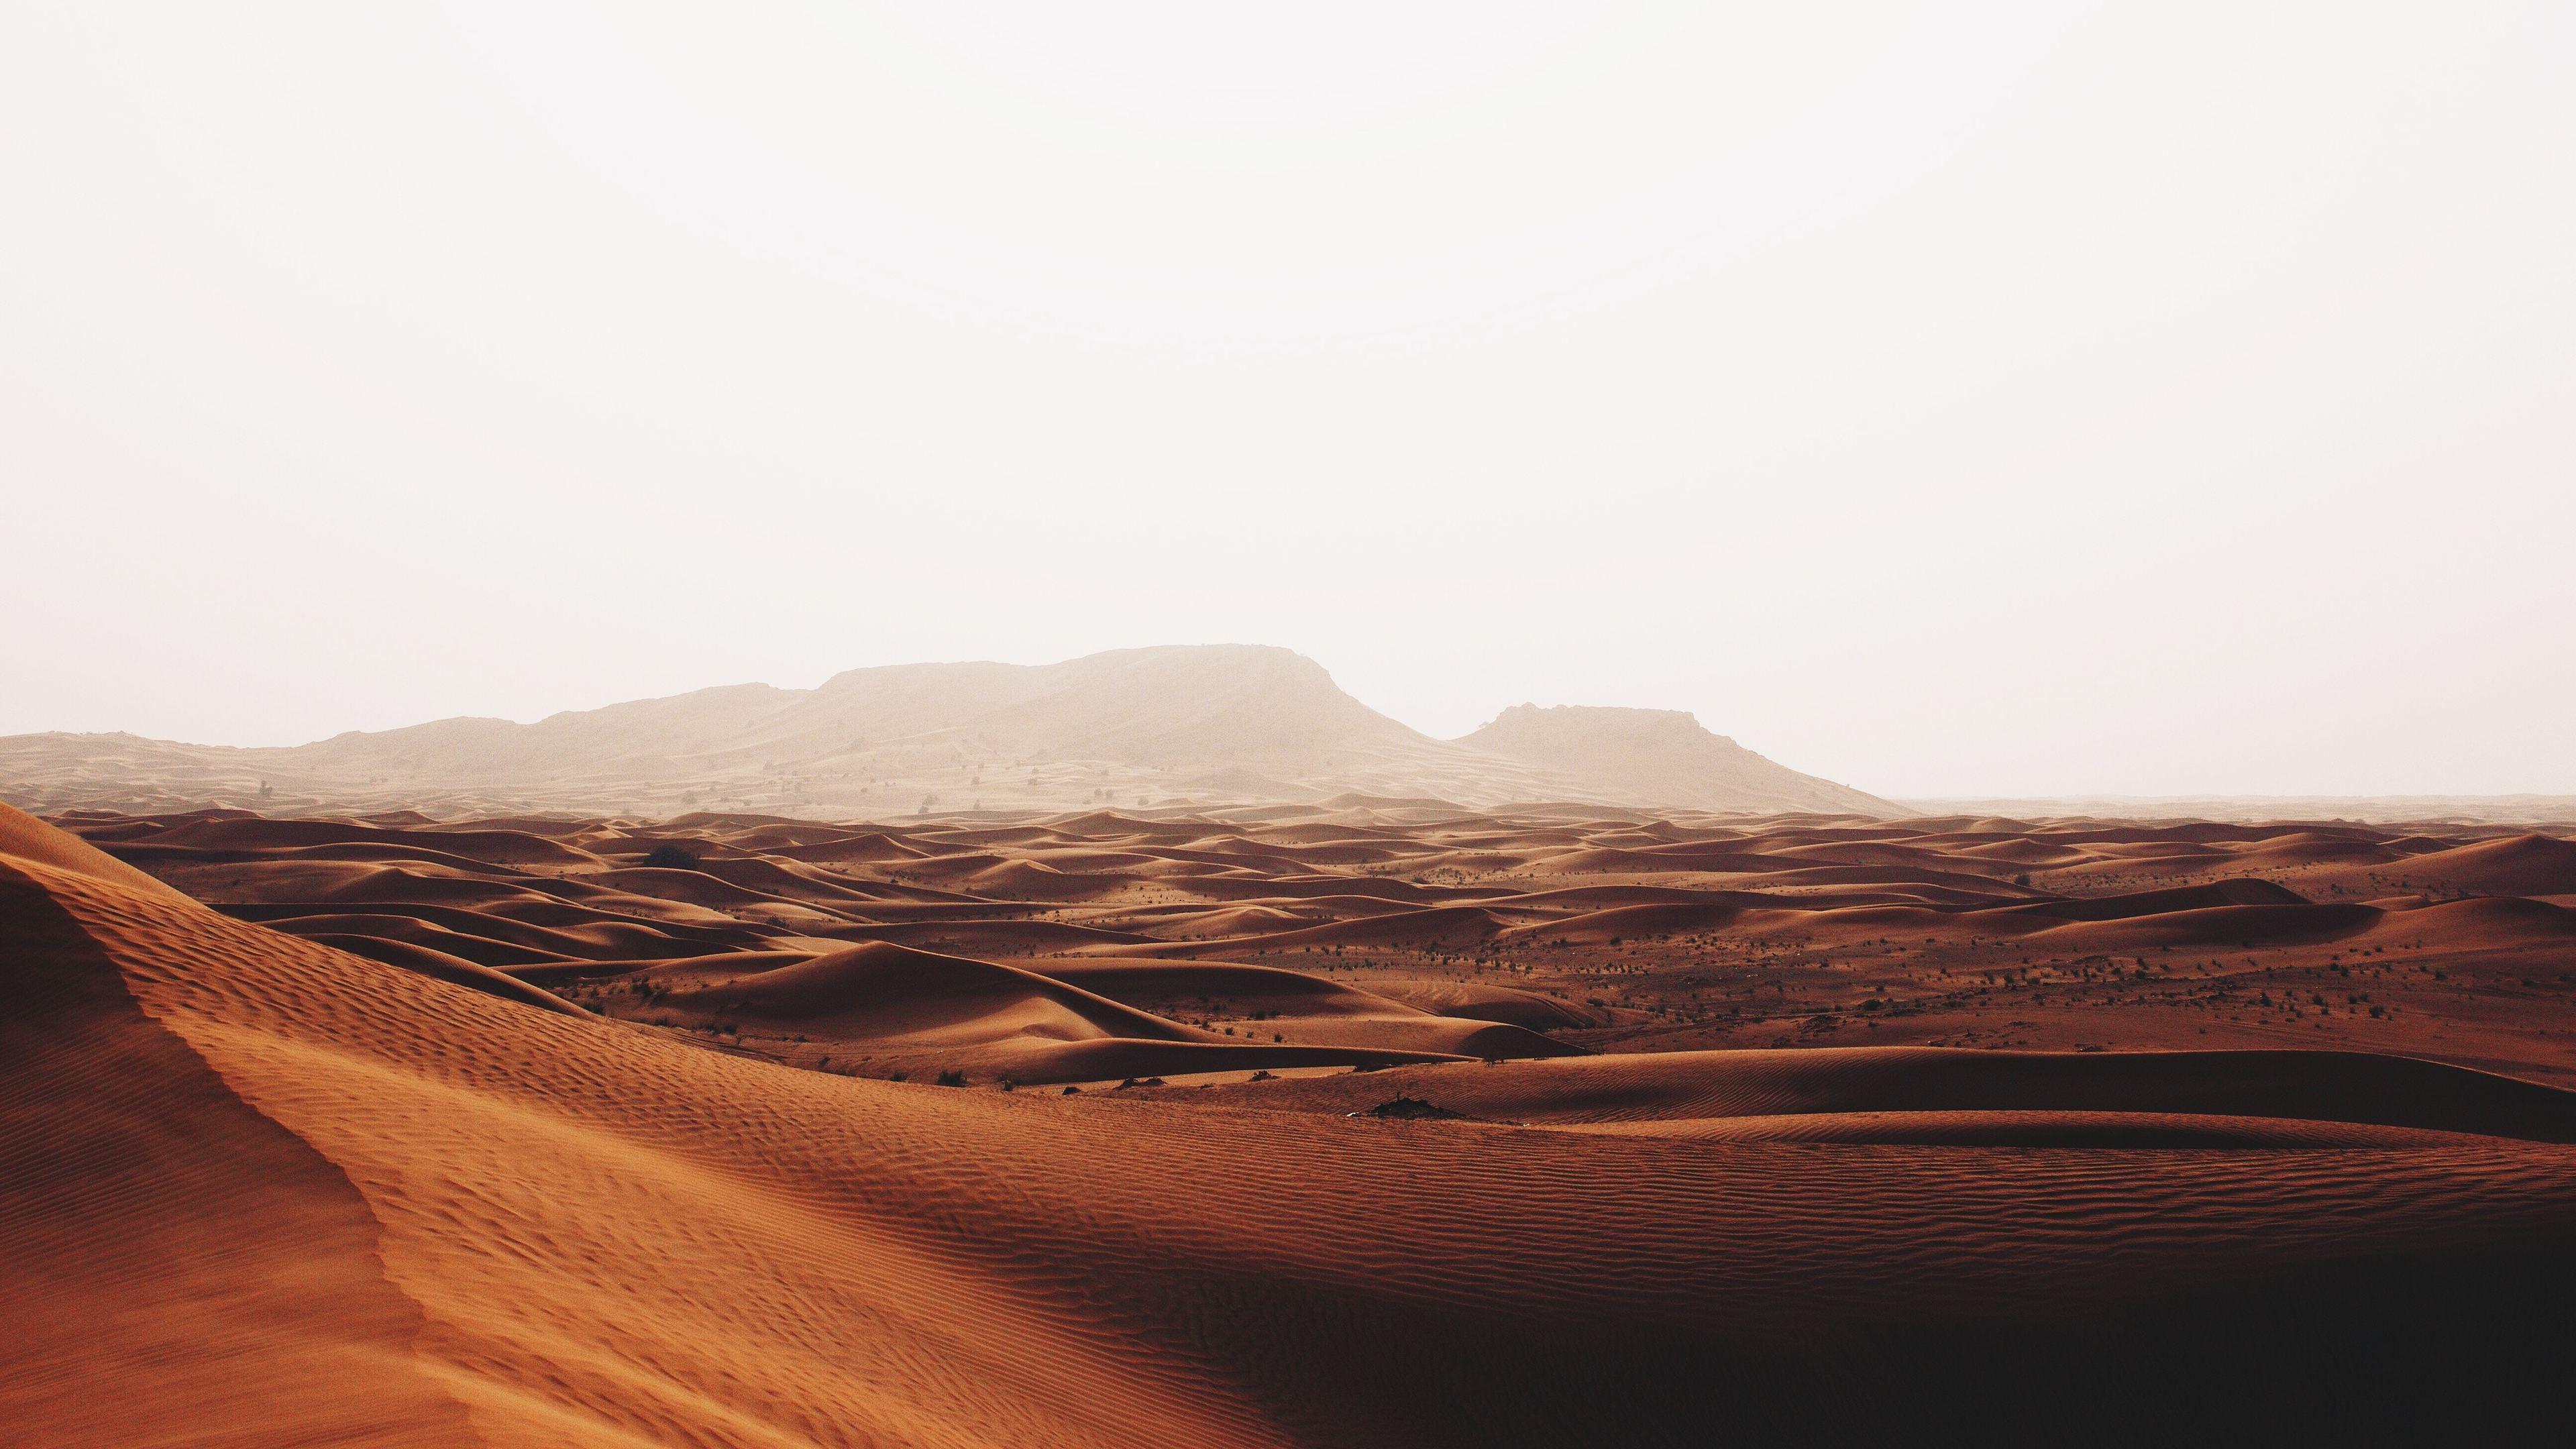 desert sandscape 4k 1540144682 - Desert Sandscape 4k - sandscape wallpapers, sand wallpapers, nature wallpapers, hd-wallpapers, dunes wallpapers, desert wallpapers, 4k-wallpapers